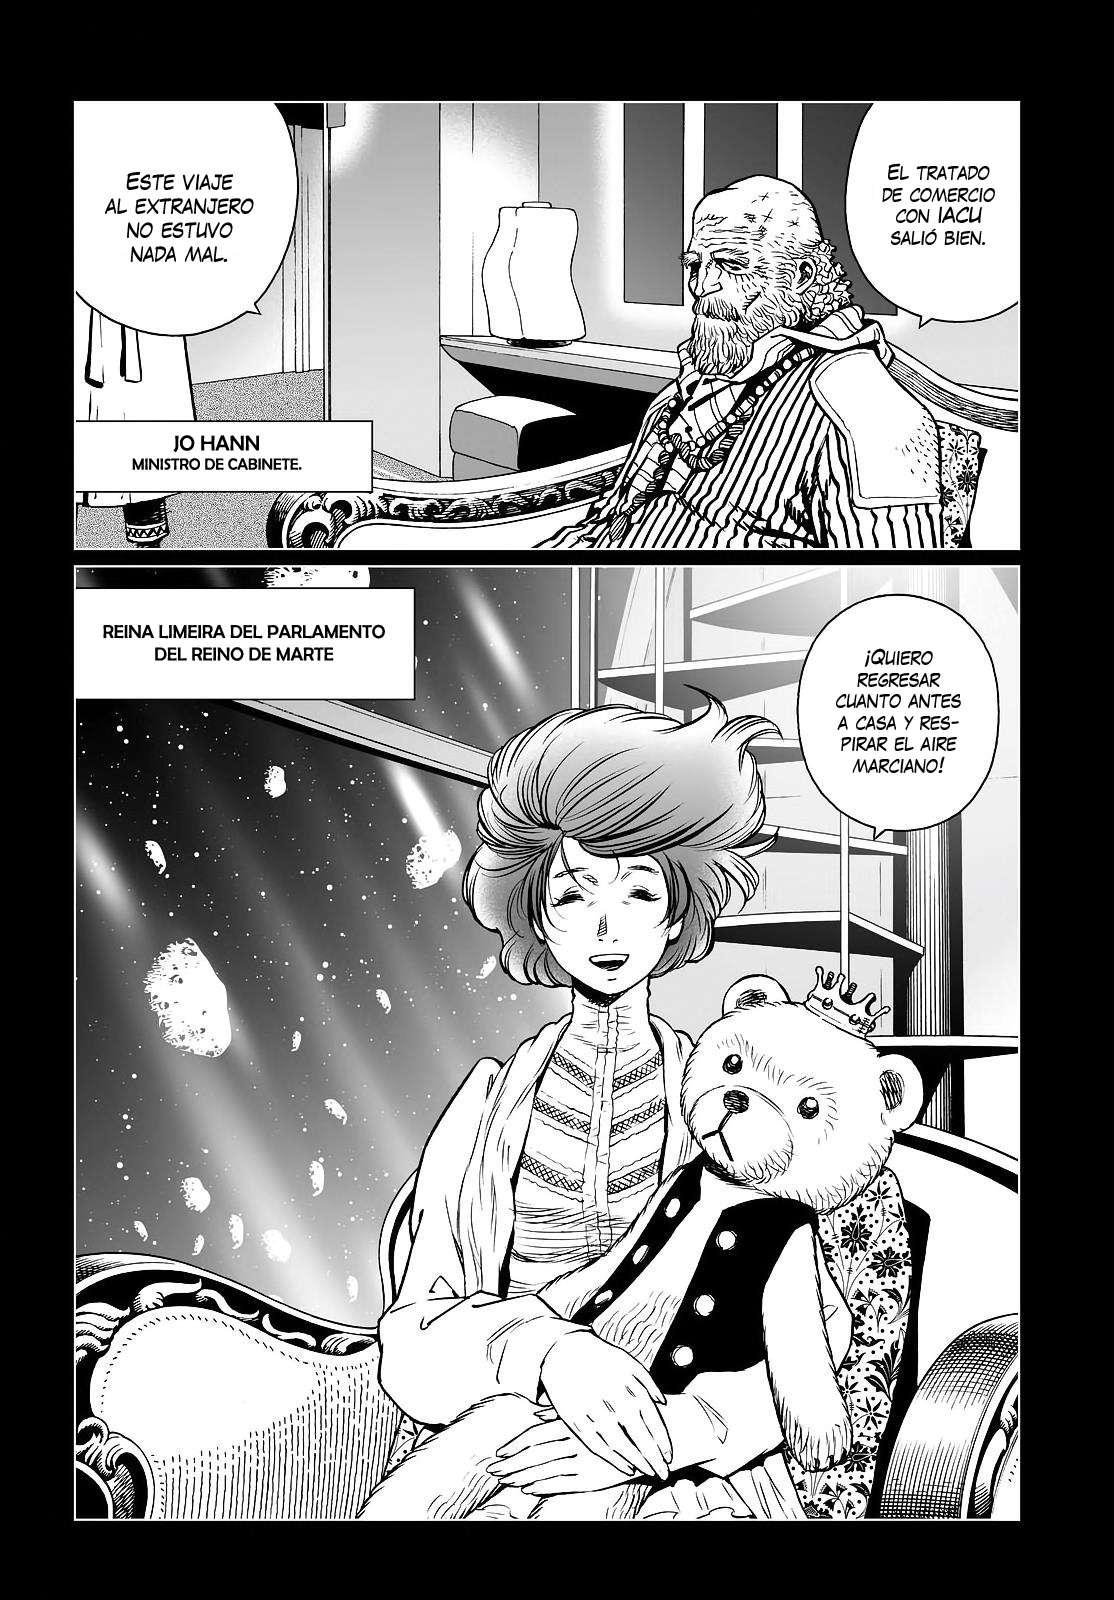 https://c5.ninemanga.com/es_manga/41/18217/423023/d5b8b3be24c4c9f5716774e9fc80f830.jpg Page 3